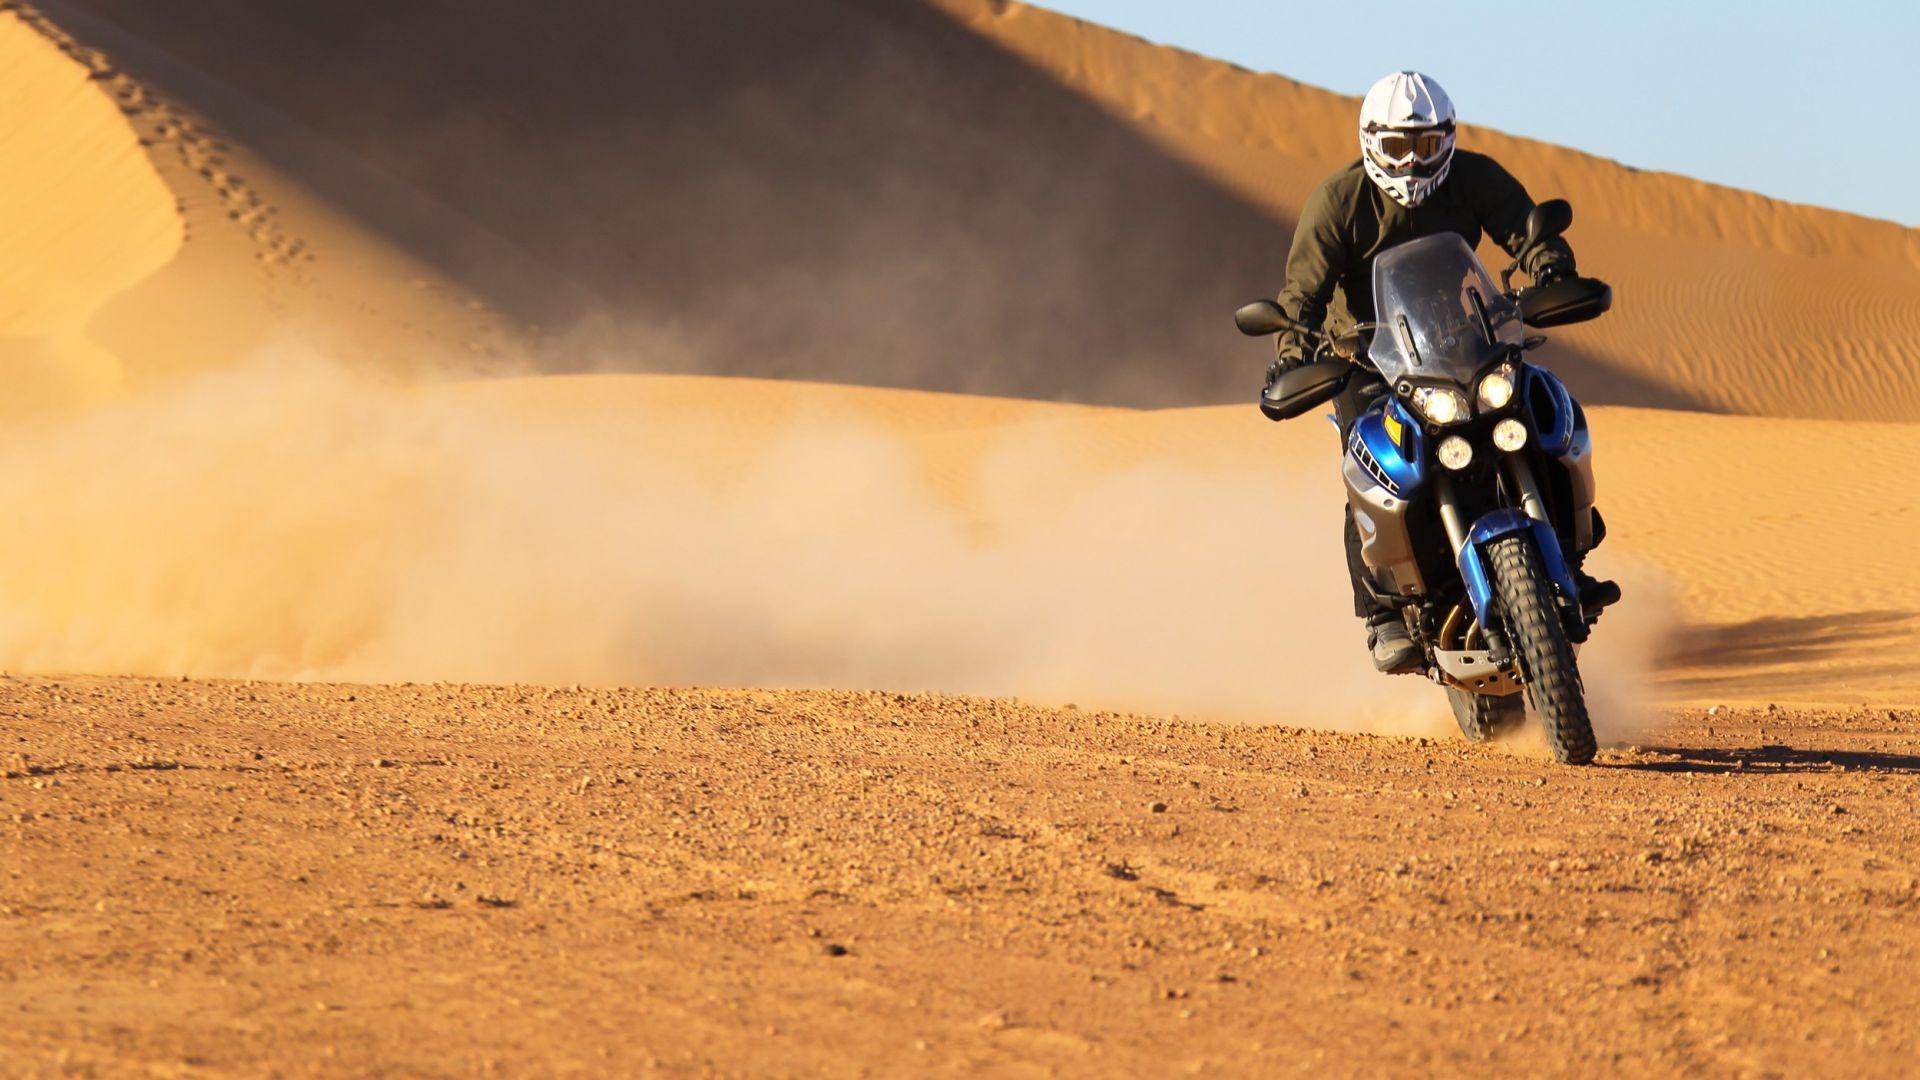 Immagine 68: In Marocco con la Yamaha Super Ténéré